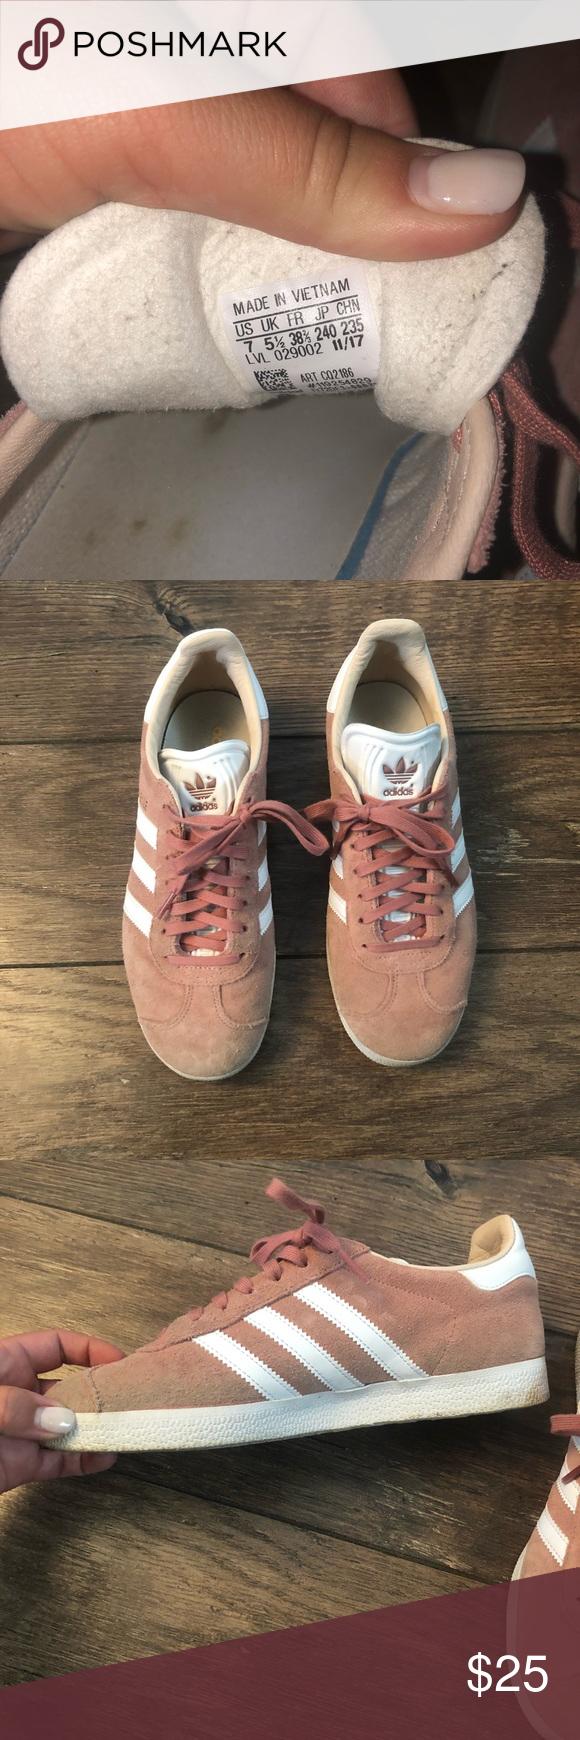 Adidas pink gazelle size 7 | Pink